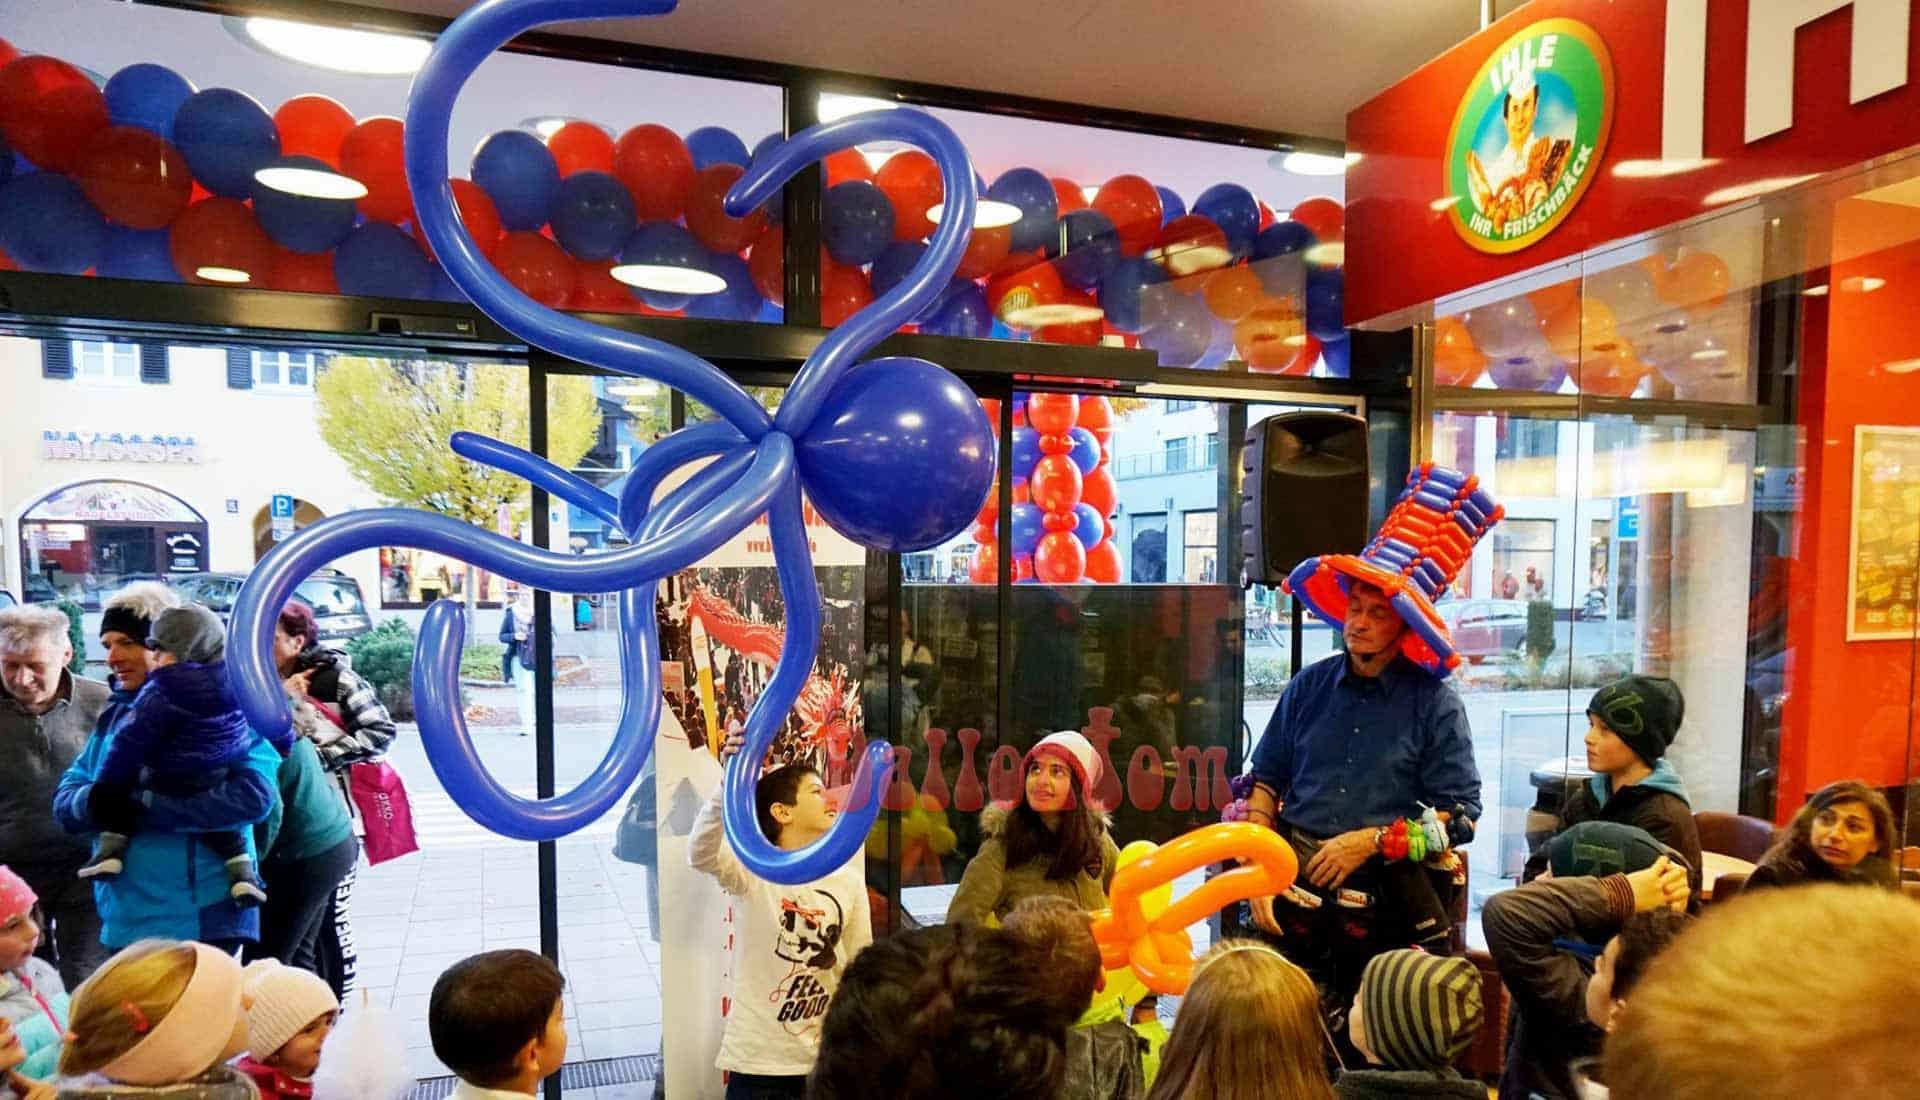 Entertainment mit Ballons - fliegende Riesenkracke